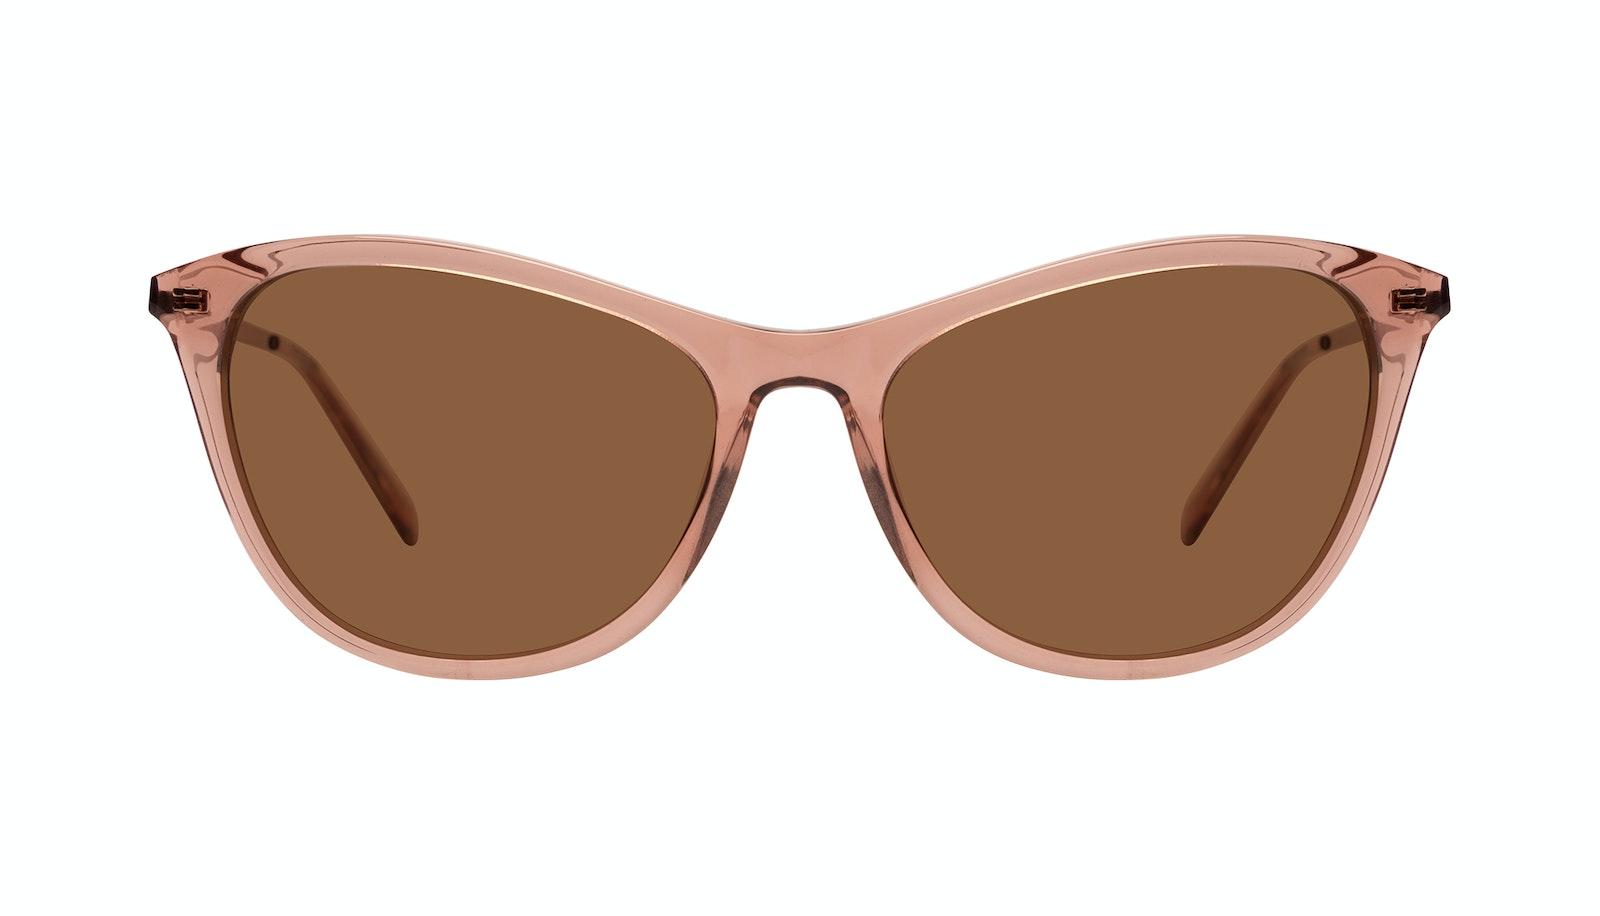 Affordable Fashion Glasses Rectangle Sunglasses Women Folk Plus Rose